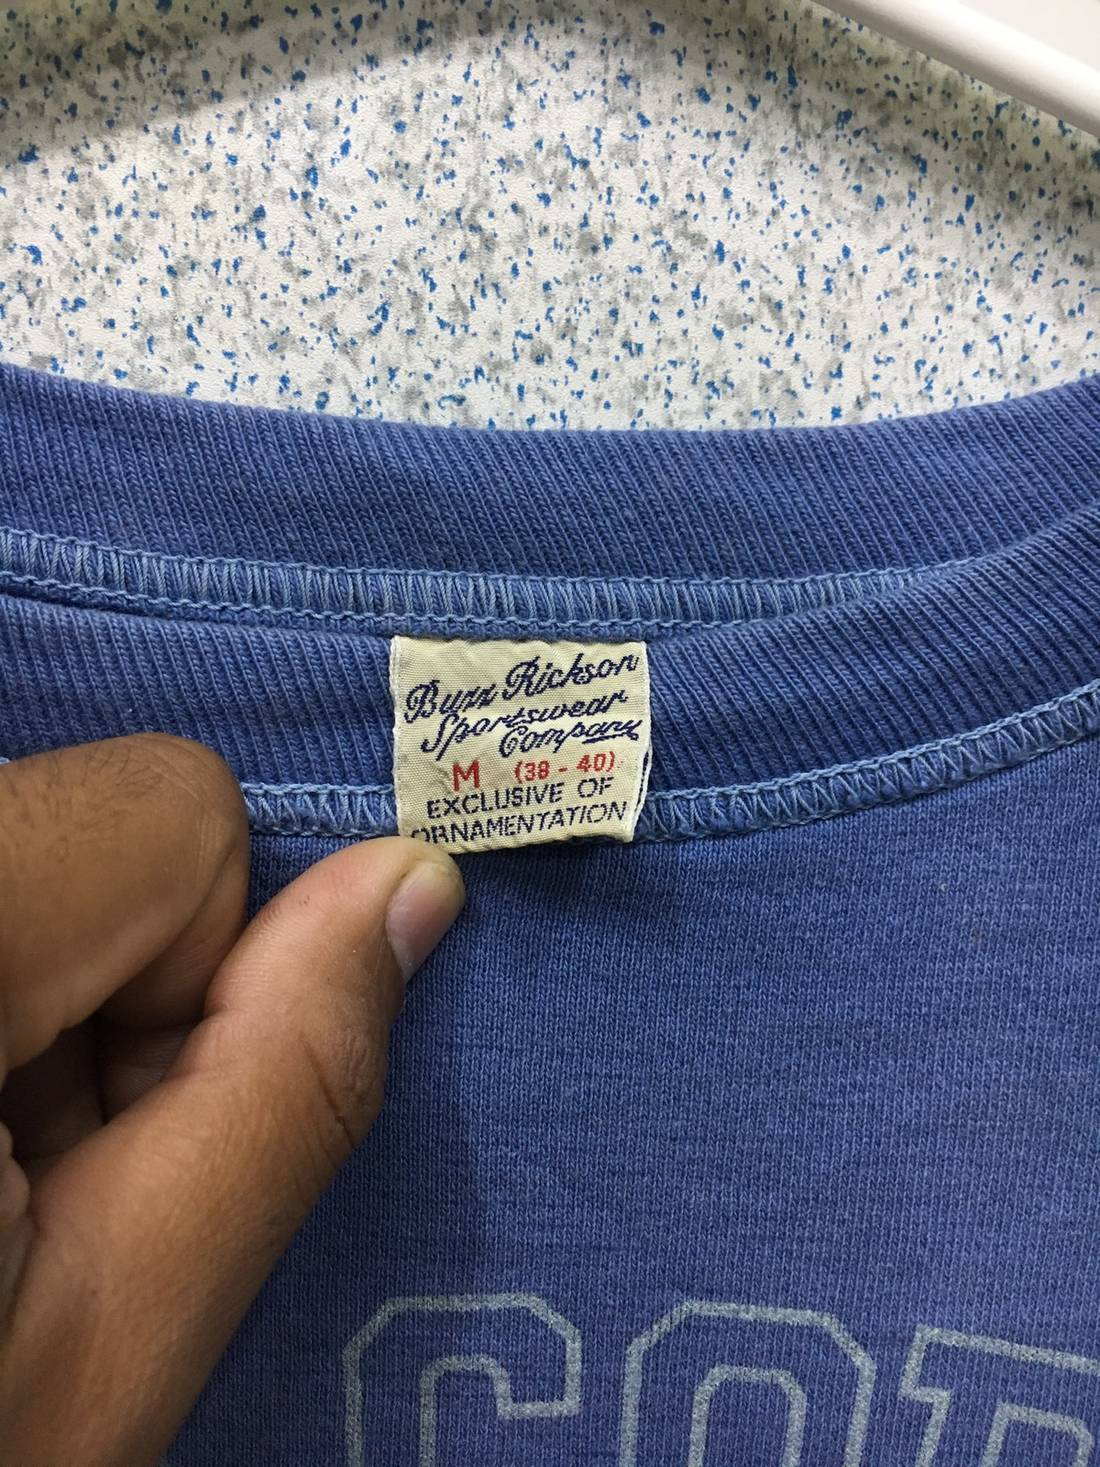 RARE !! Vintage Buzz Rickson Sportswear Company Air Cops us Army Big Logo 2voPu74t